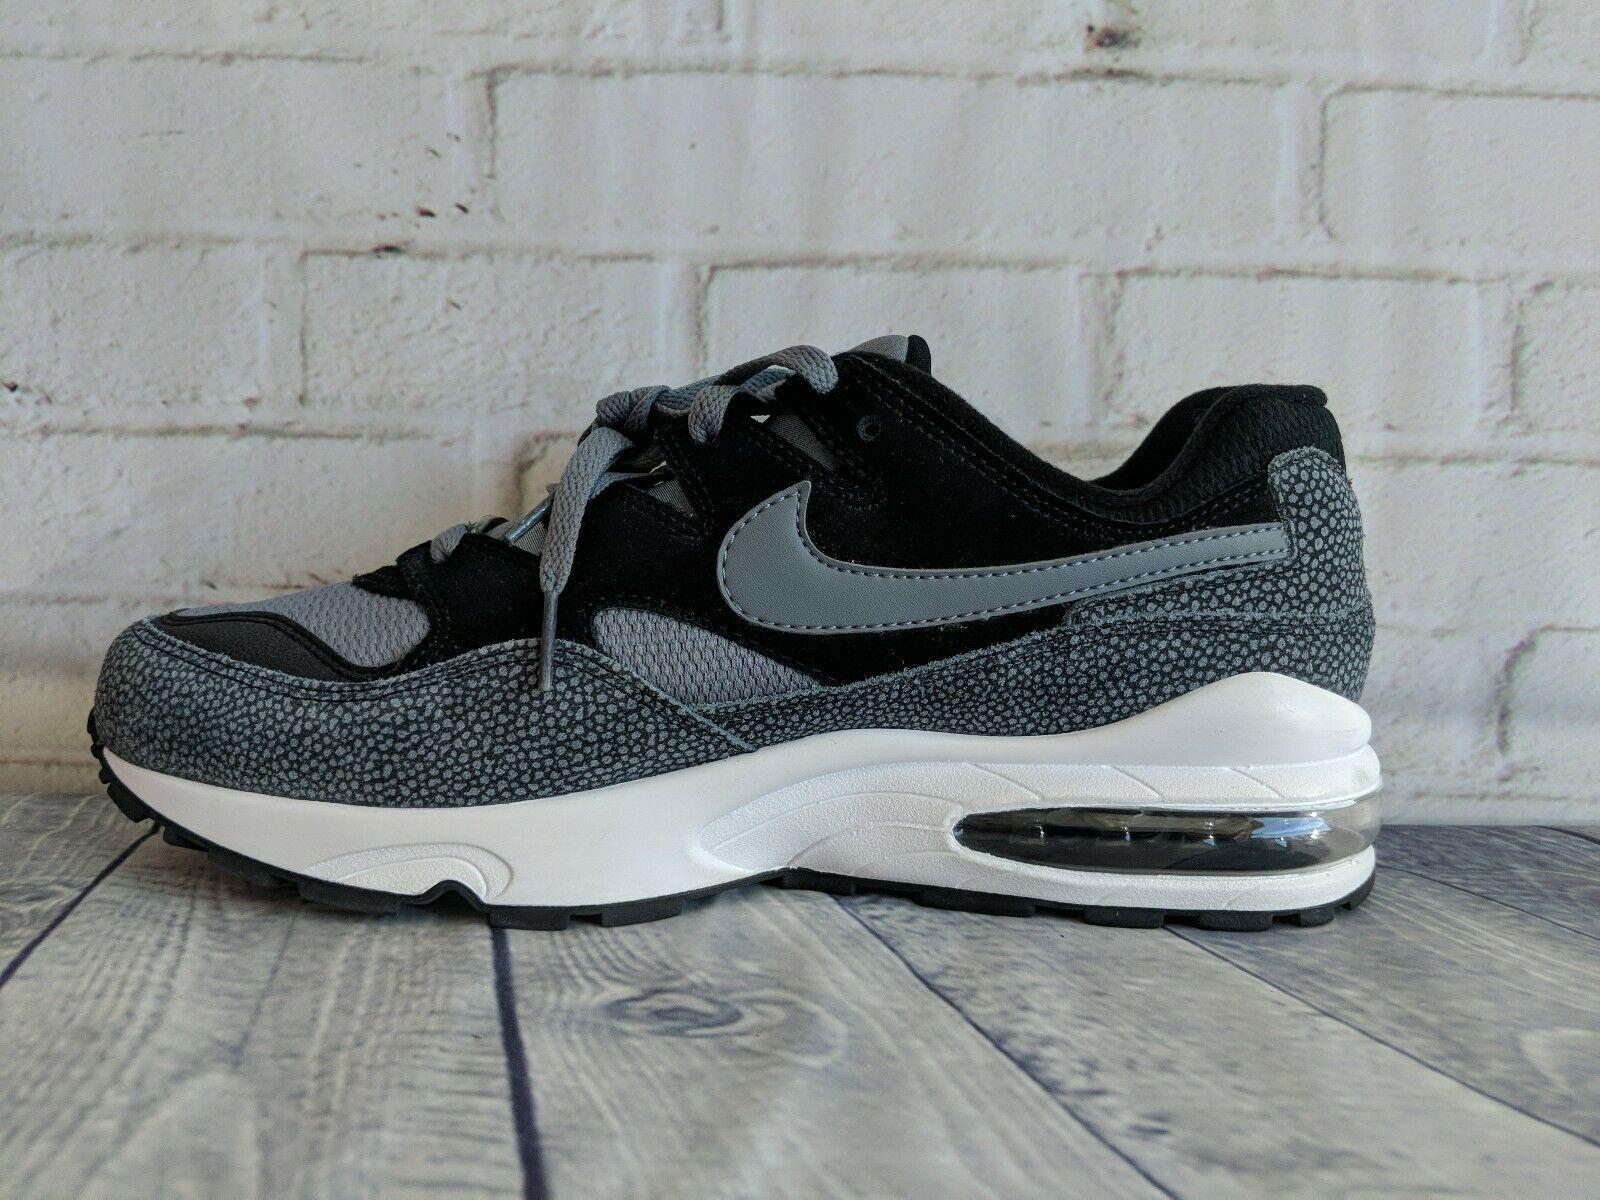 DS Nike Air Max 94 SE Black Grey Safari 1 90 95 97 98 trainer AV8197 001 Size 10